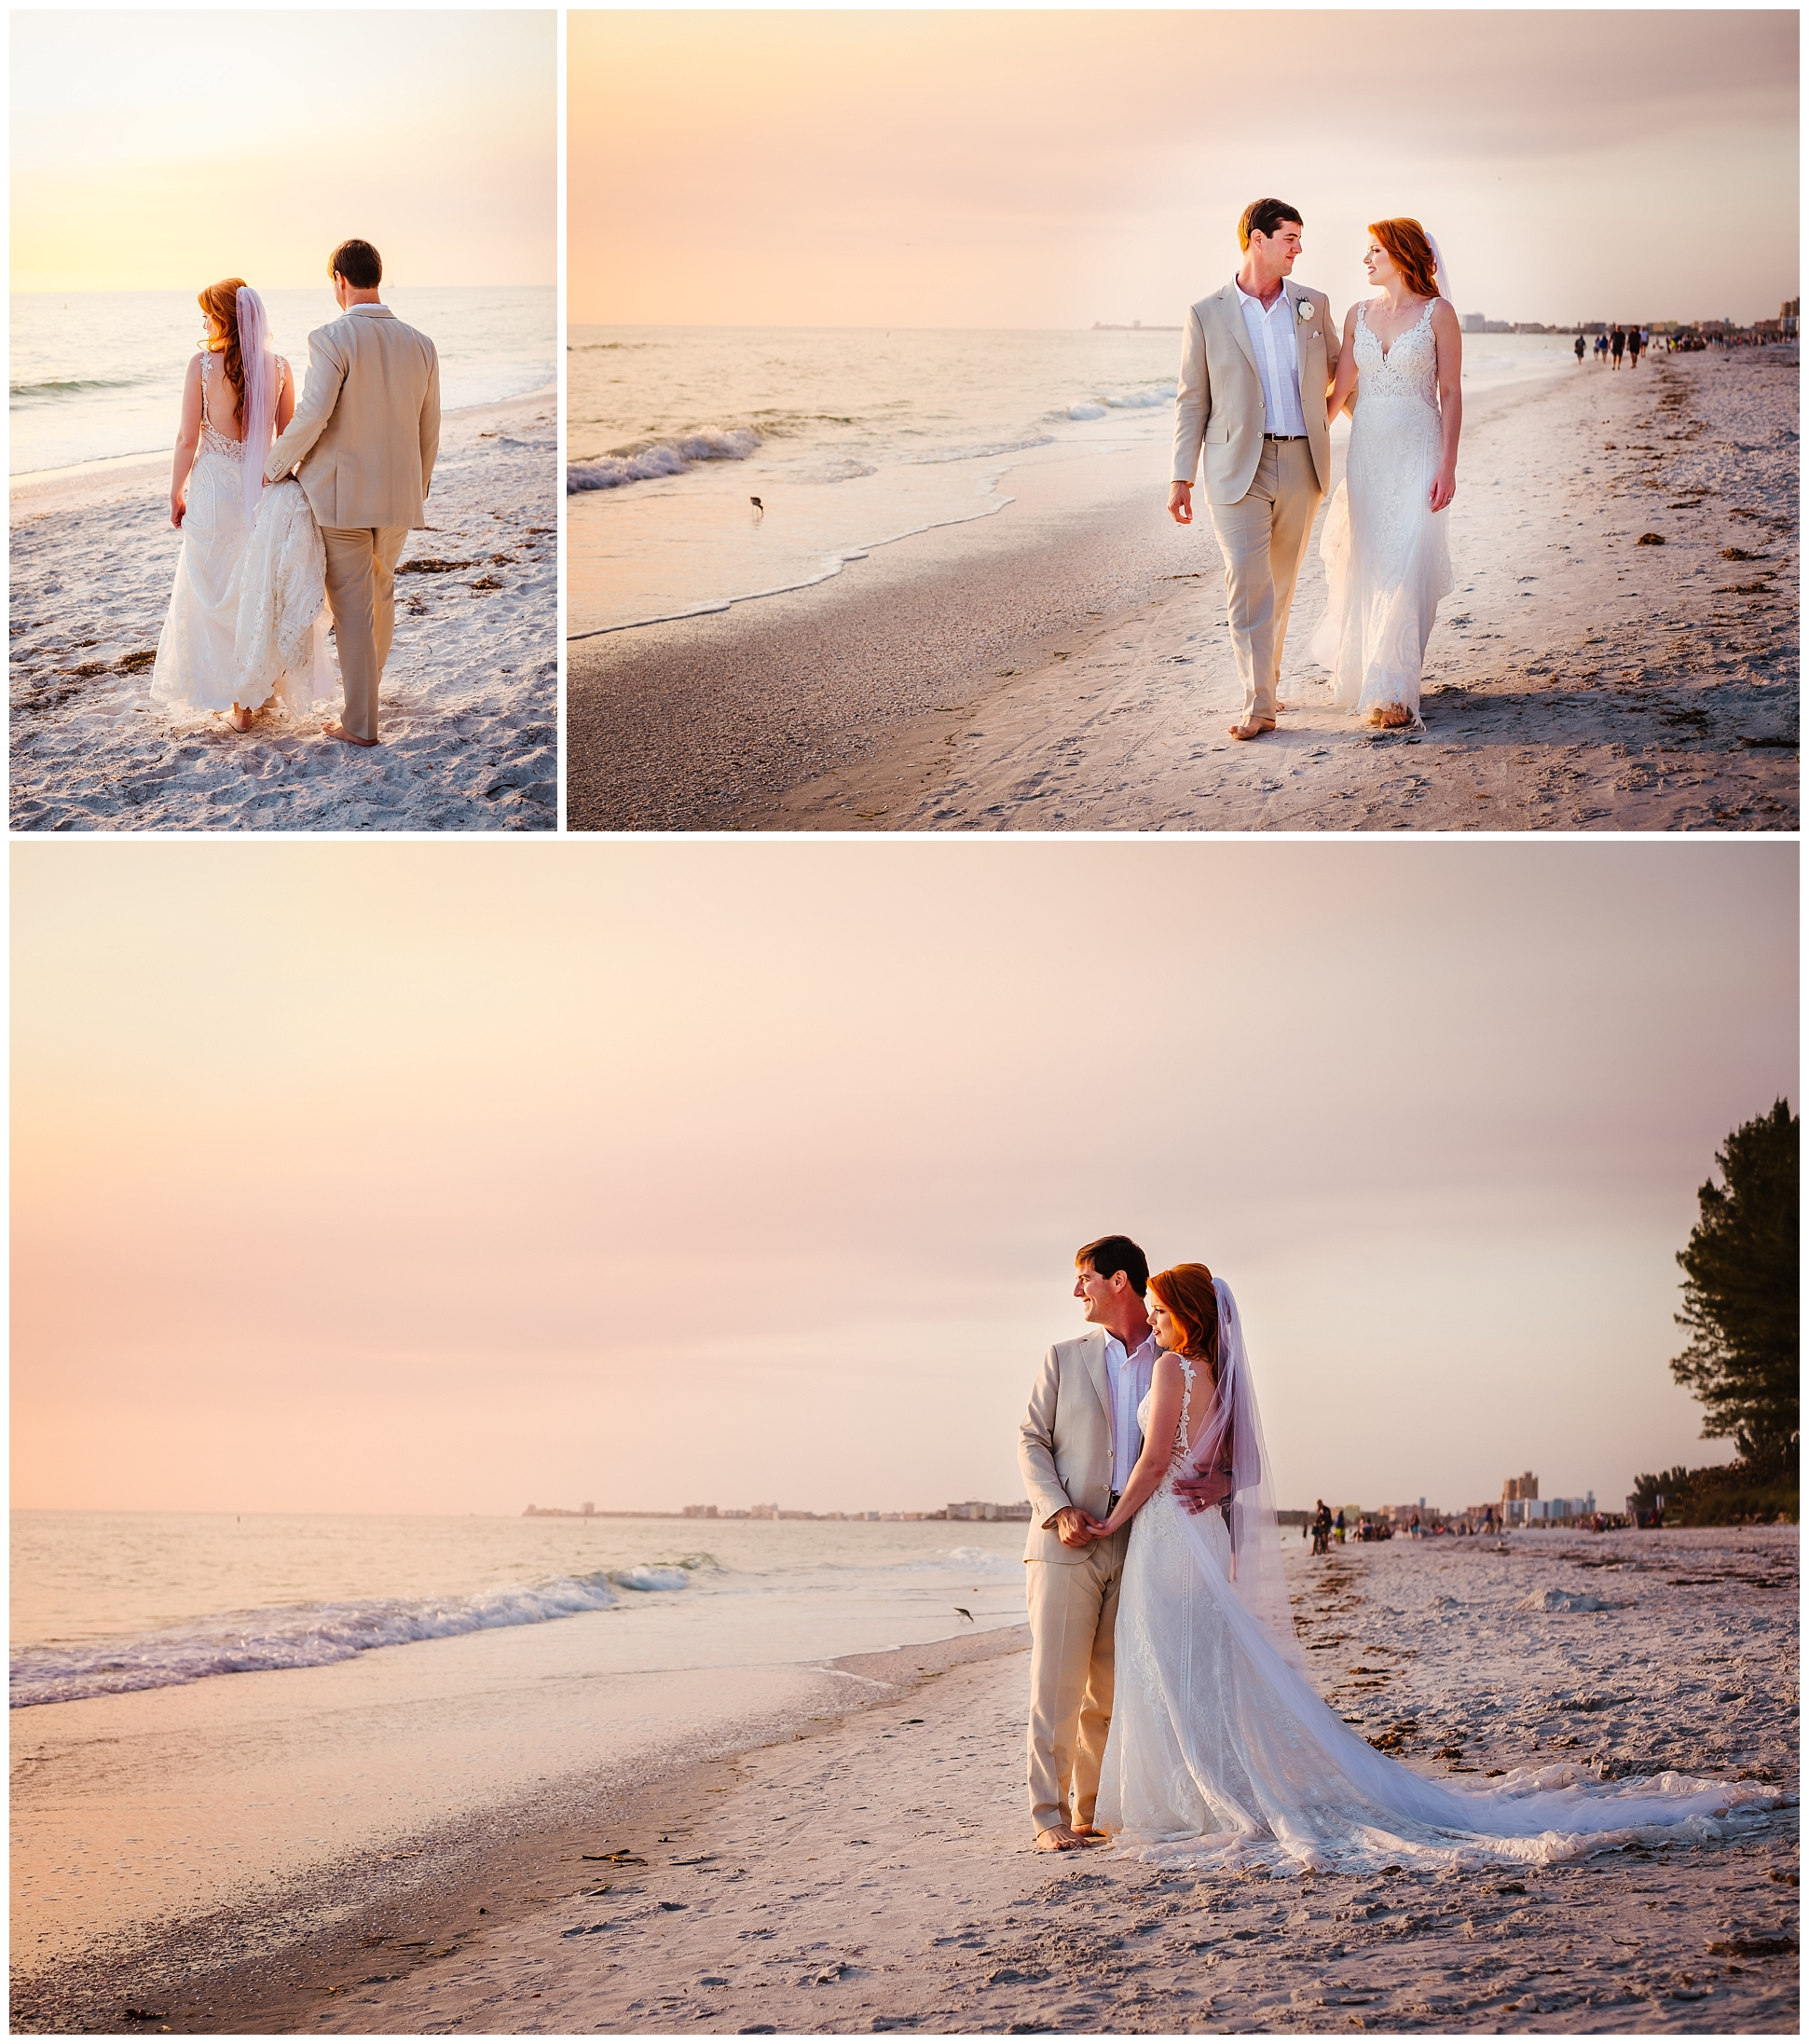 tampa-st-pete-wedding-photographer-indian-rocks-beach-mermaid-train-redhead_0159.jpg